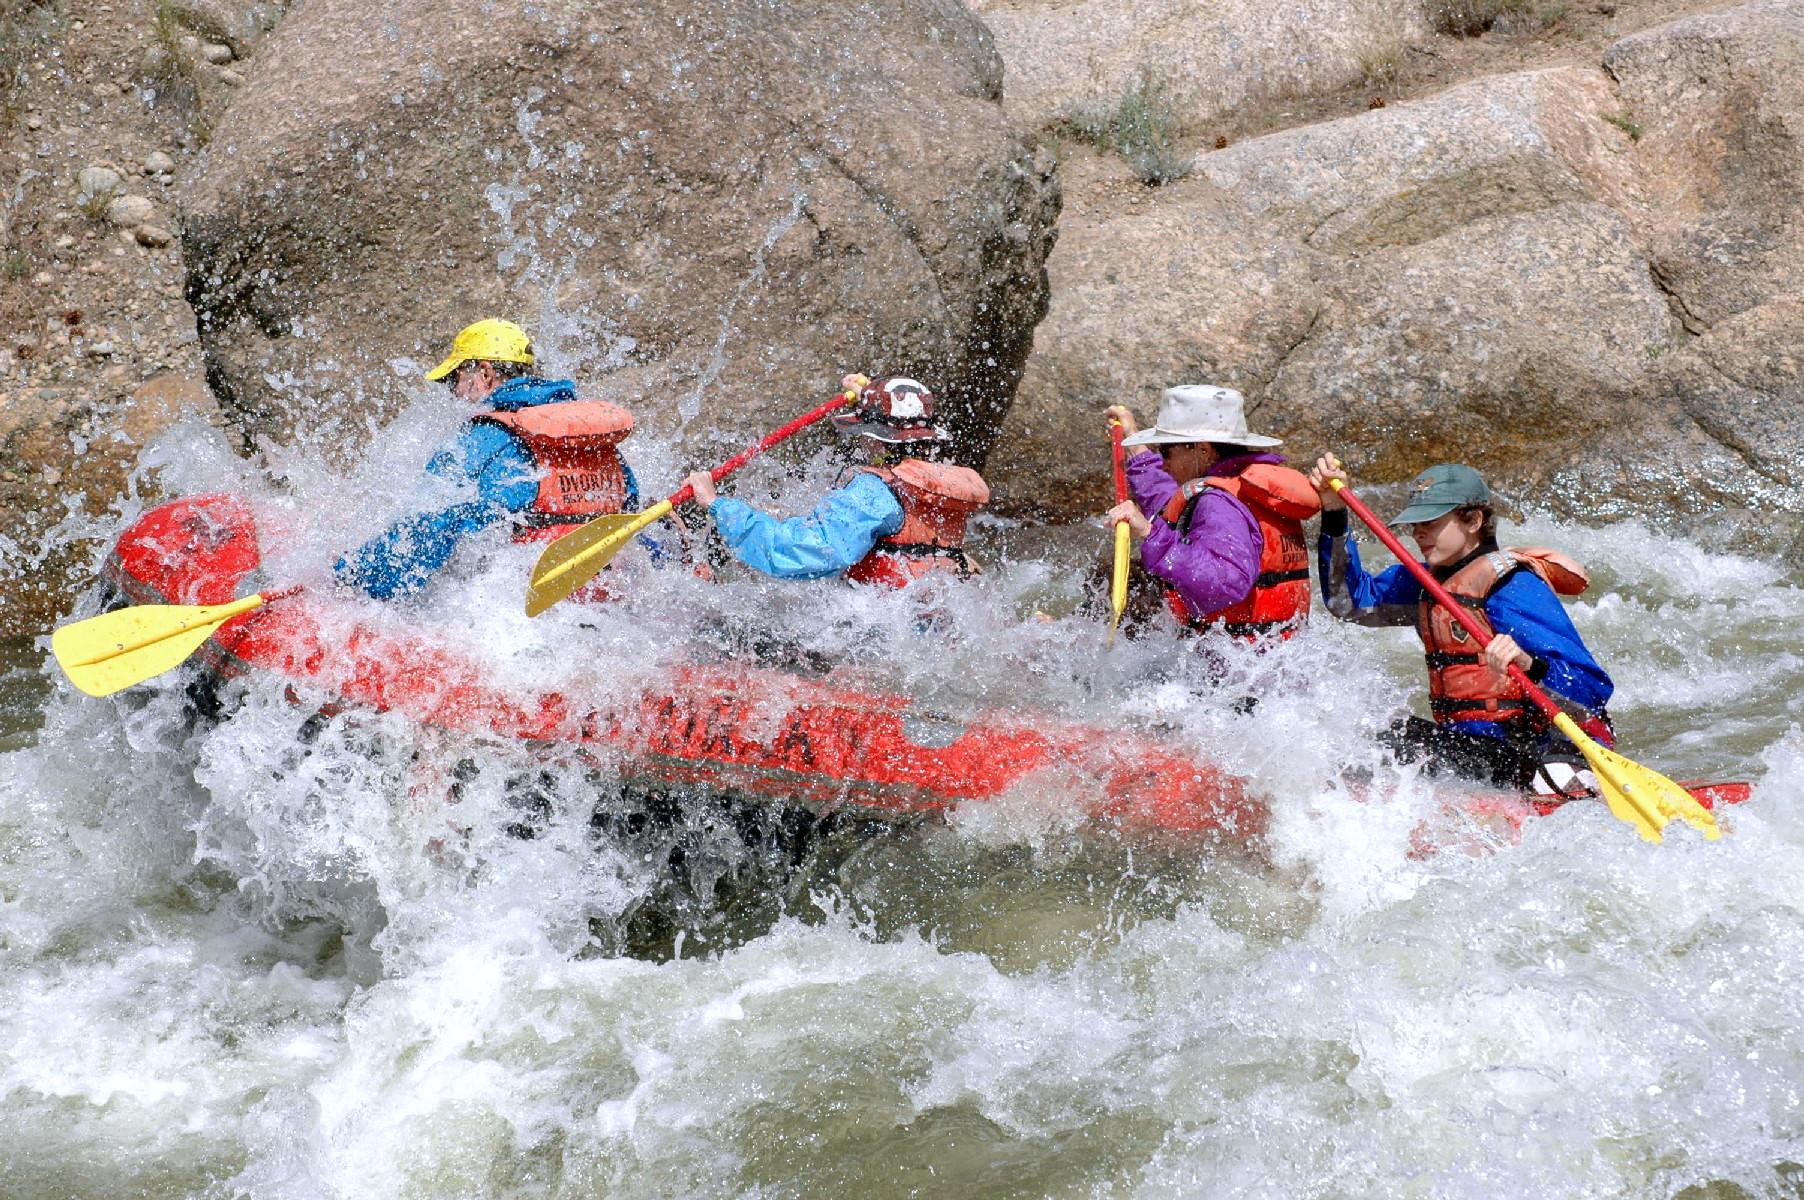 White Water Rafting Learning The Basics Actionhub